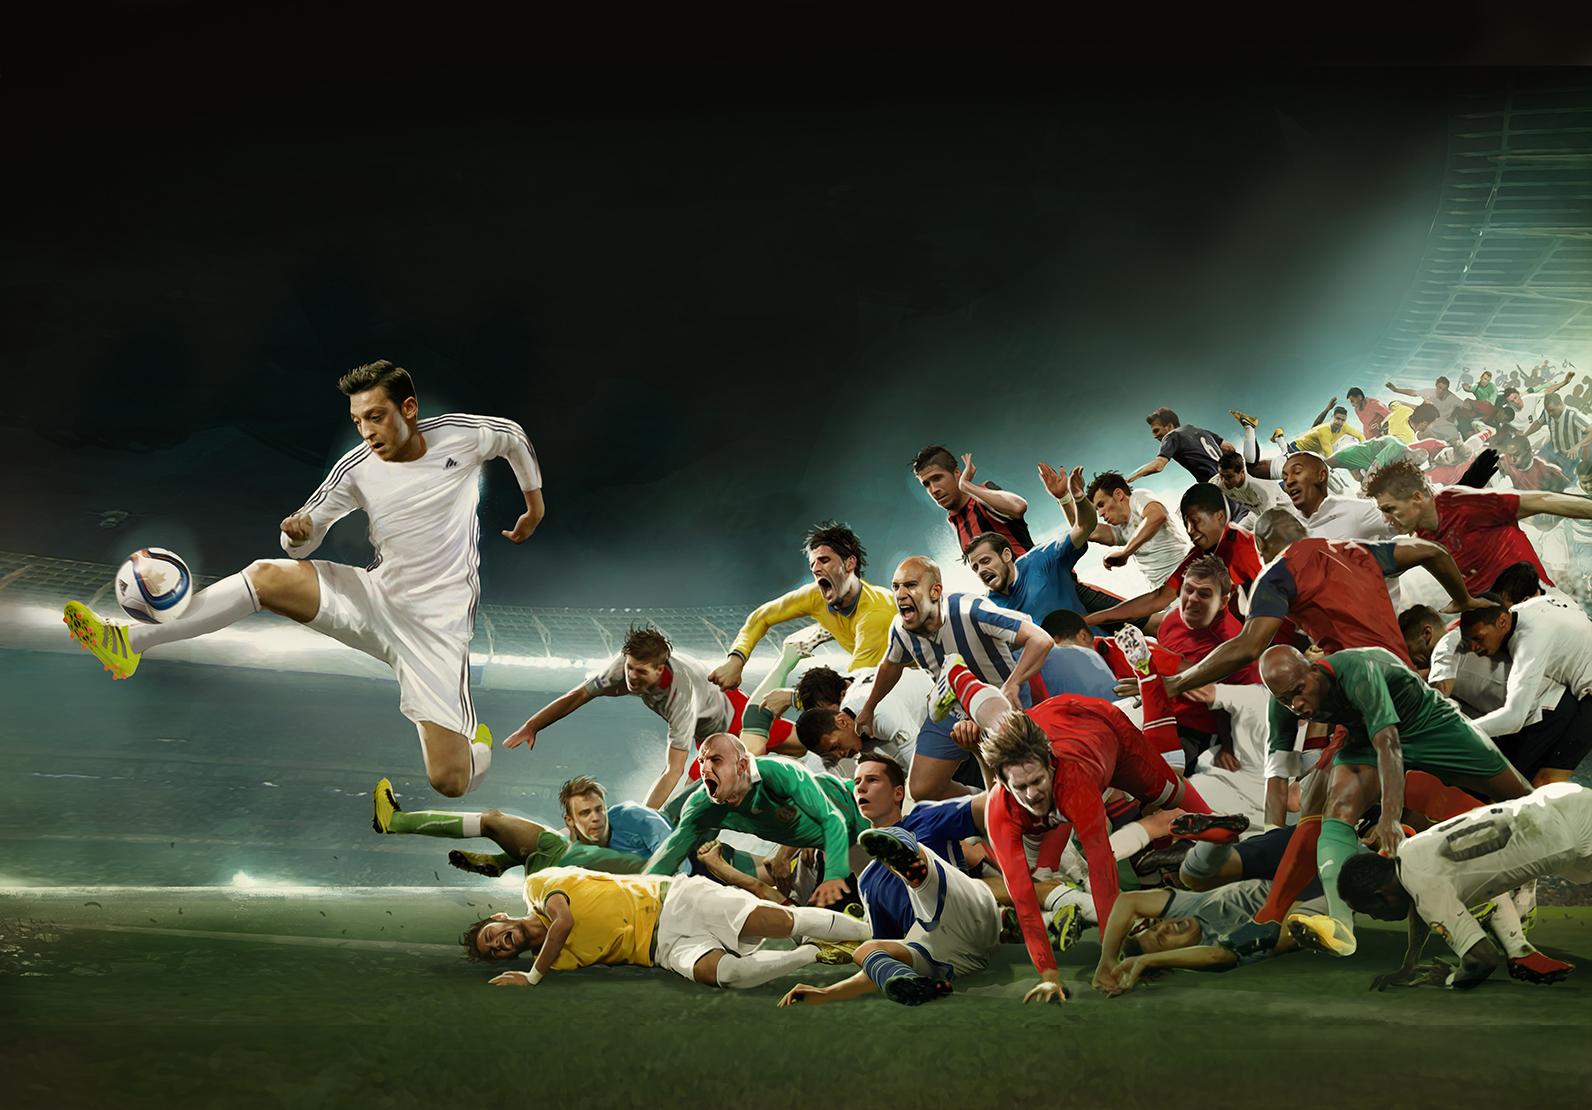 voetballersovererlkaar8